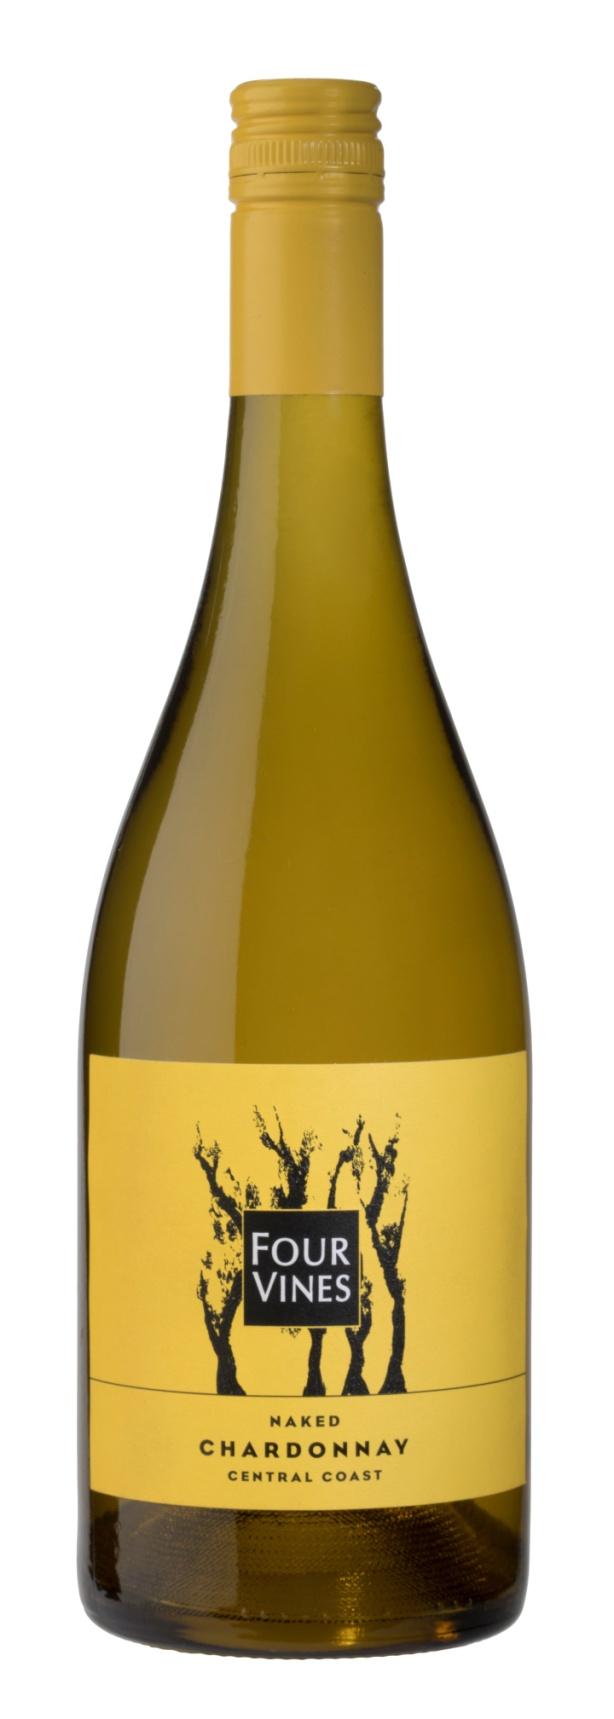 4 vines naked chardonnay wine pynck 1-21.jpg